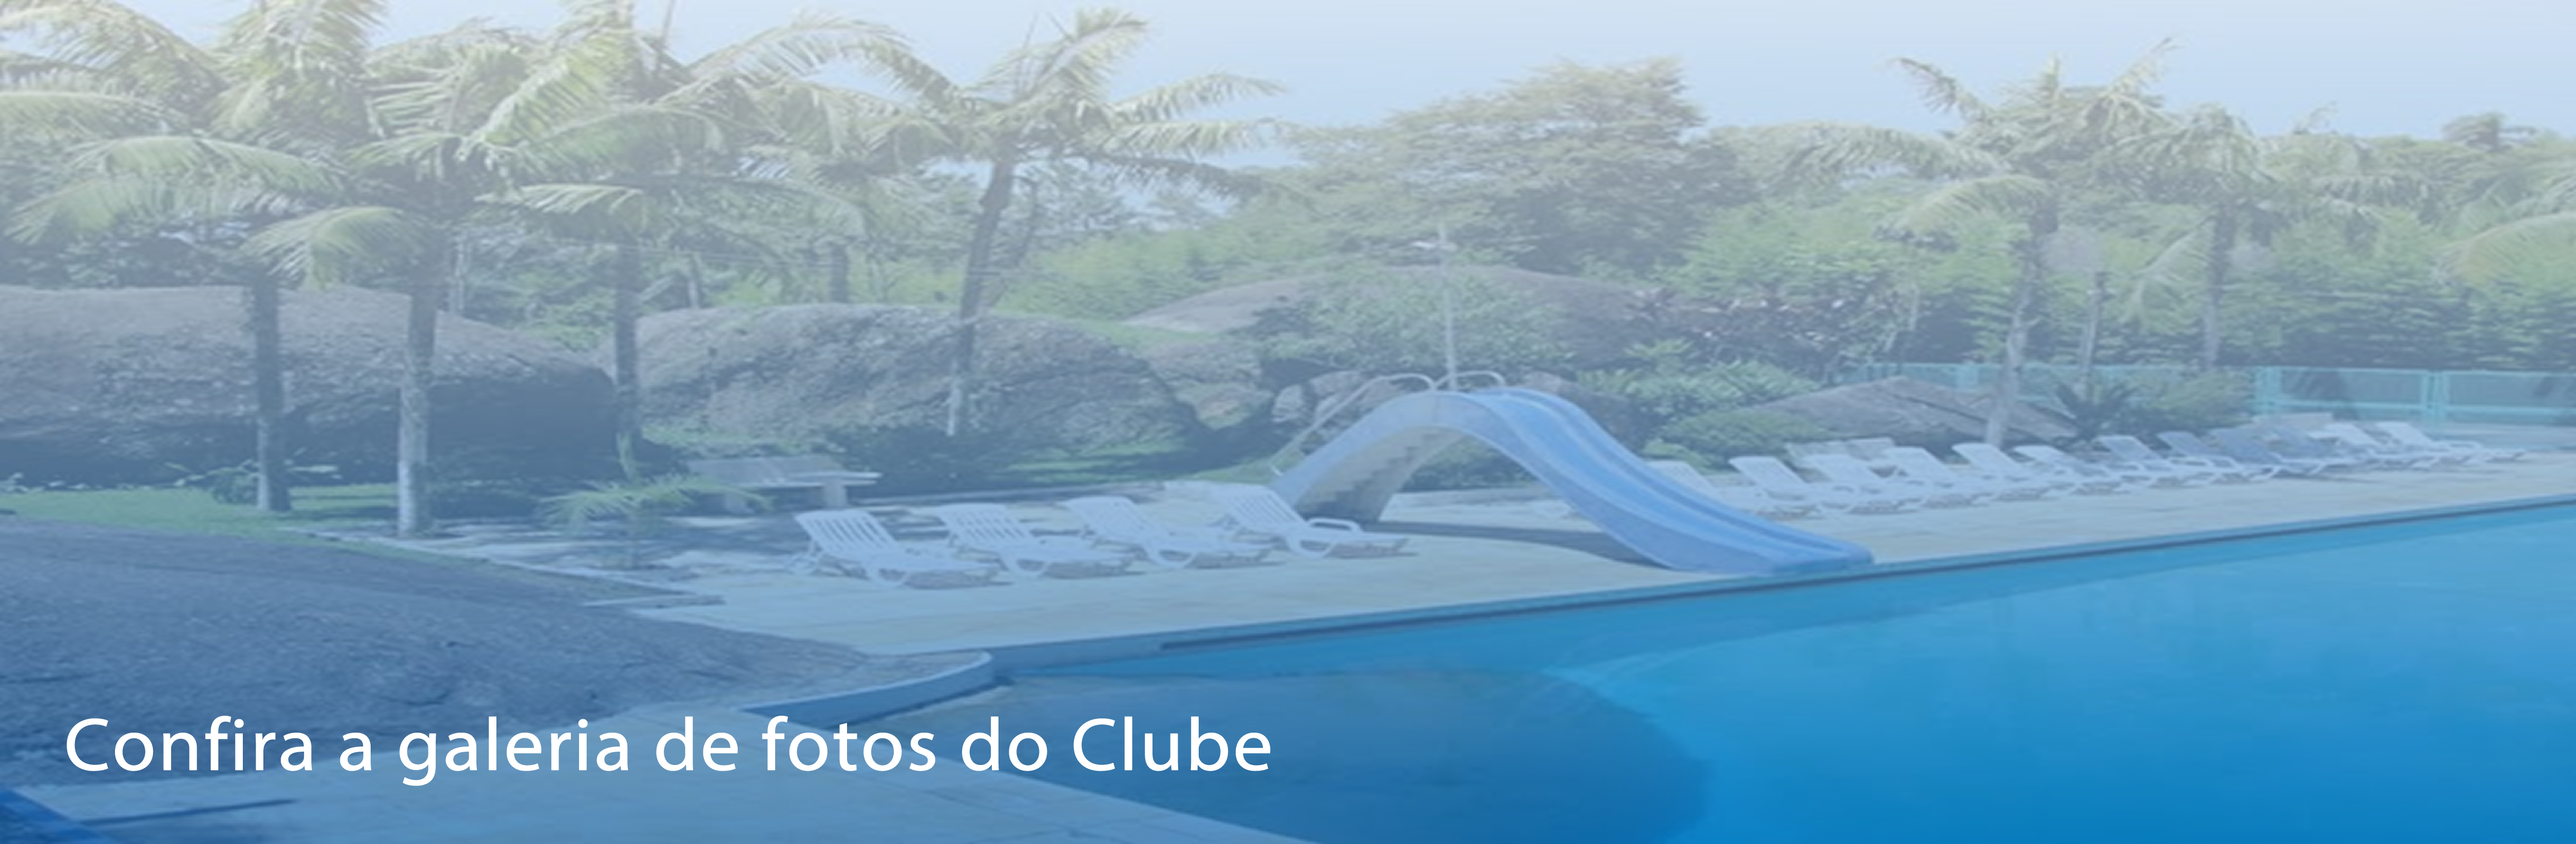 Galeria de fotos Clube